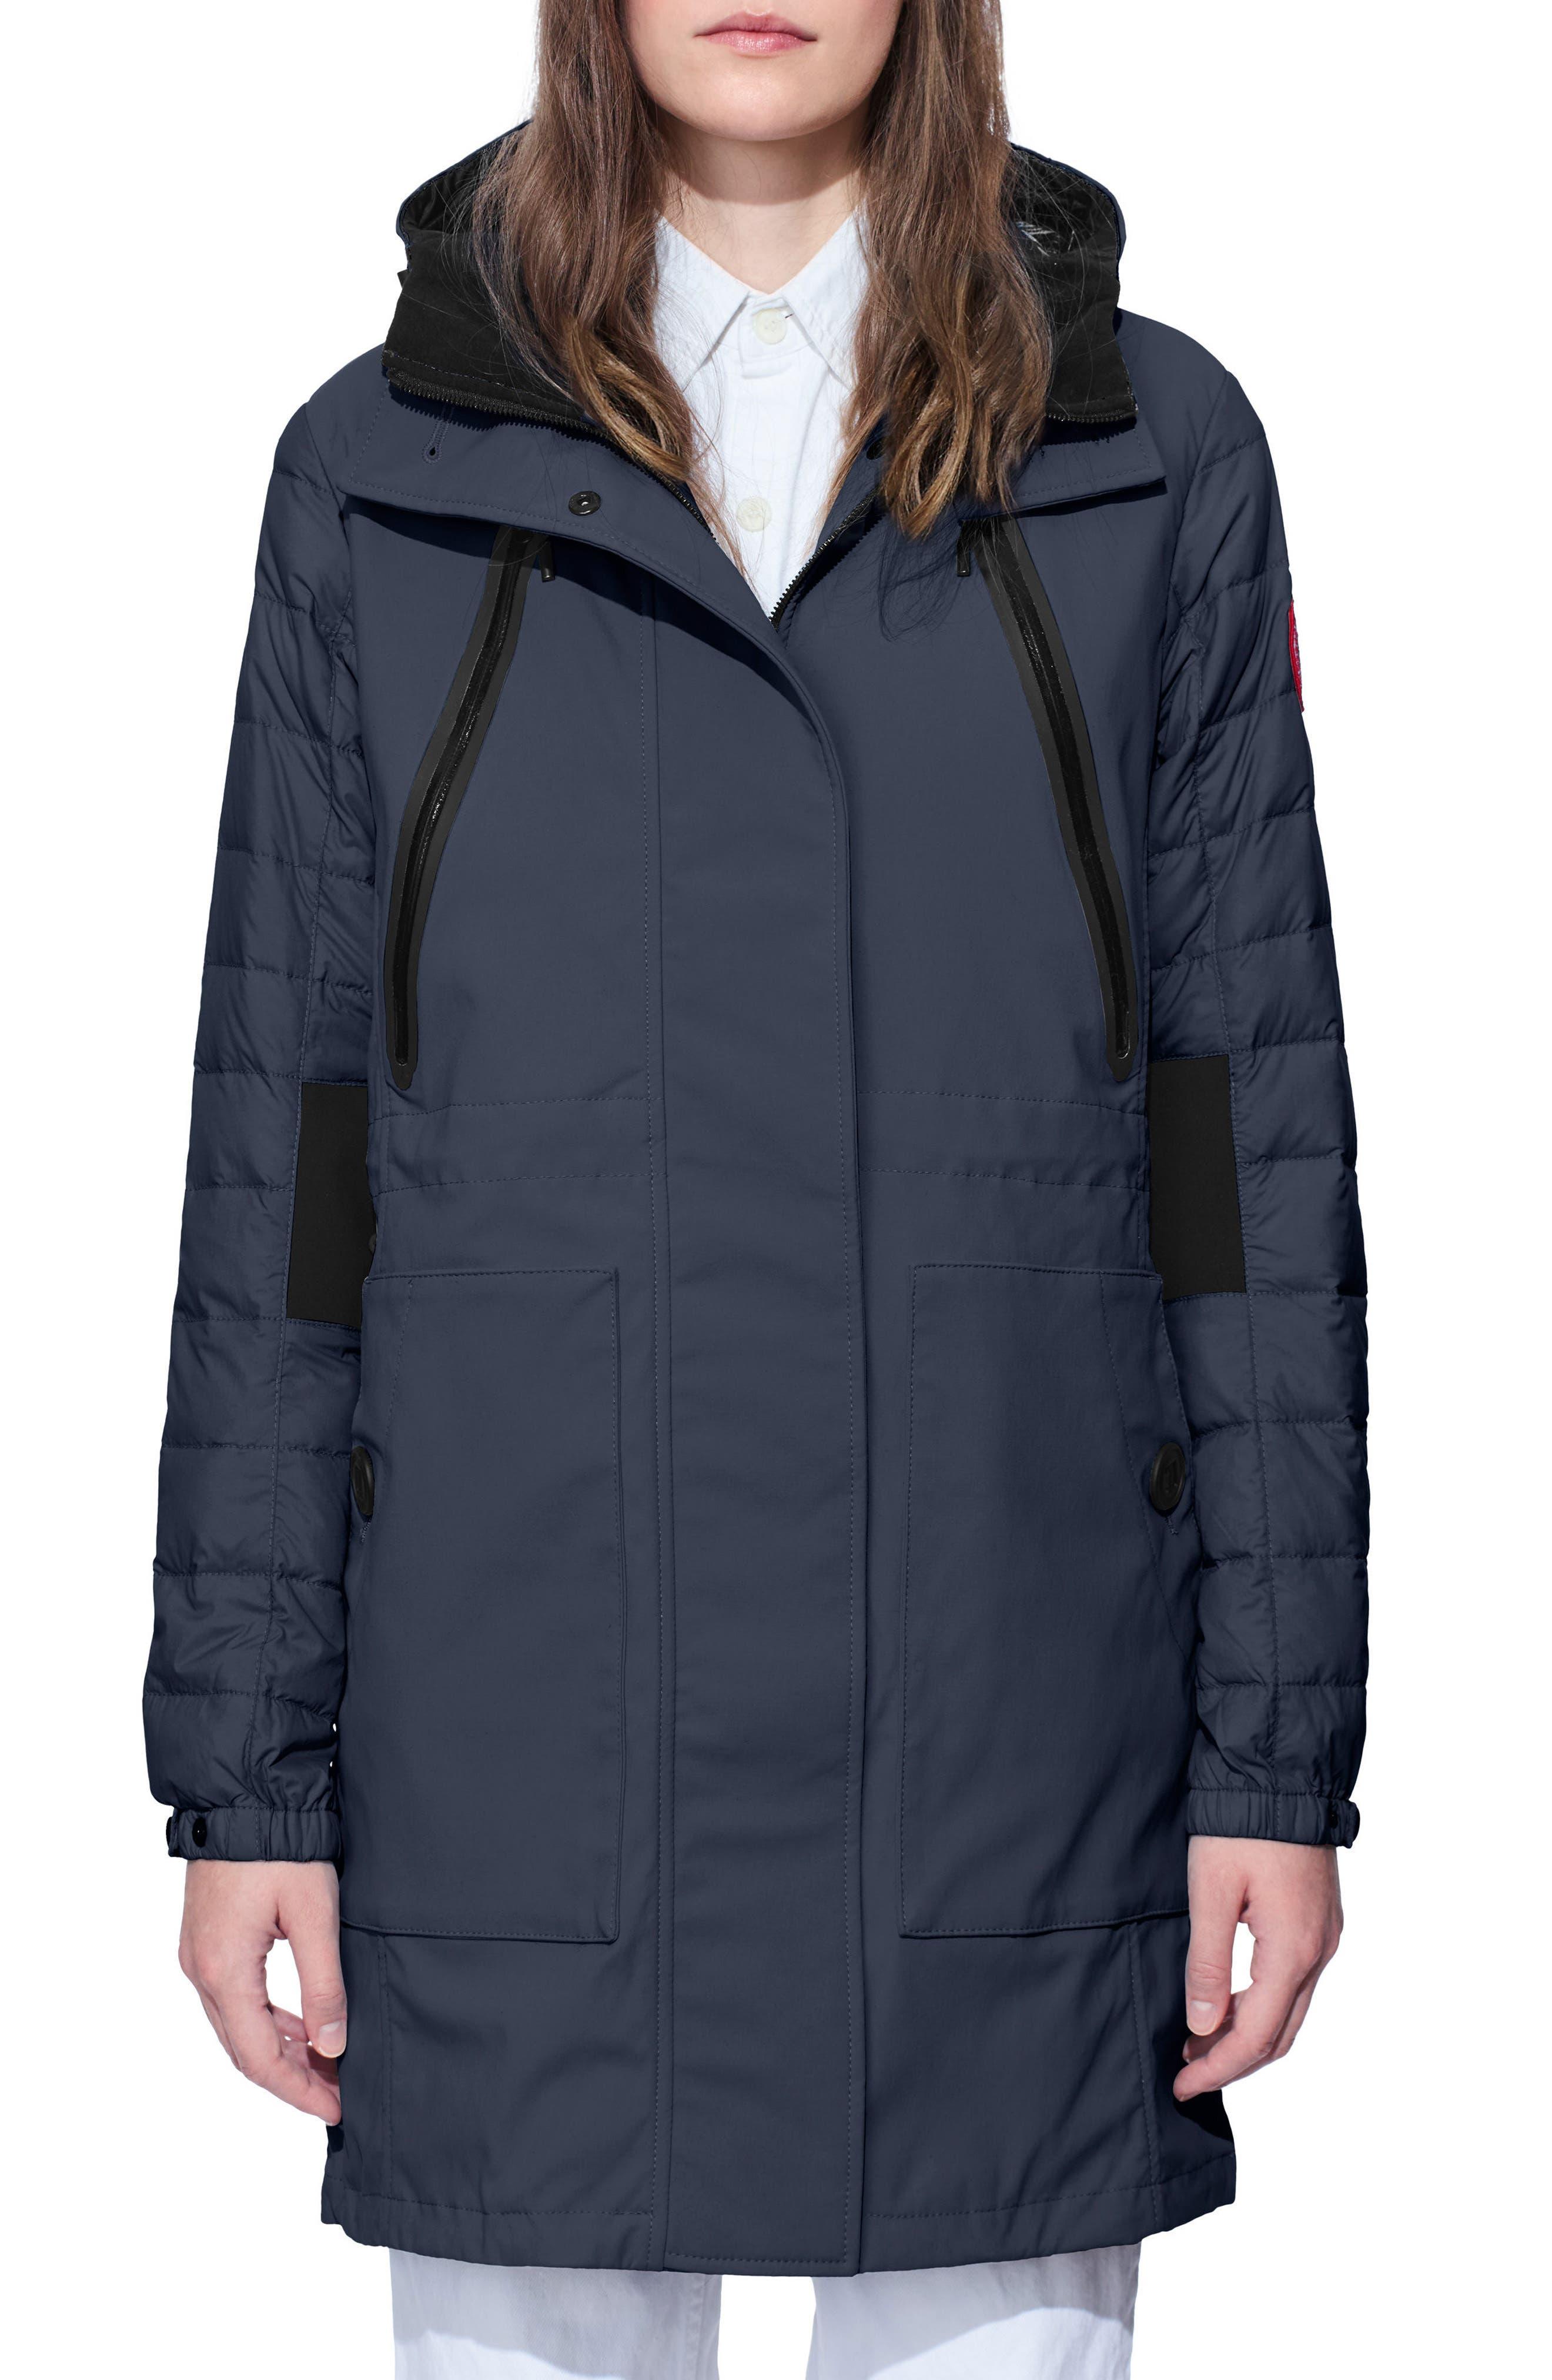 Sabine Coat,                             Main thumbnail 1, color,                             Polar Sea/ Black